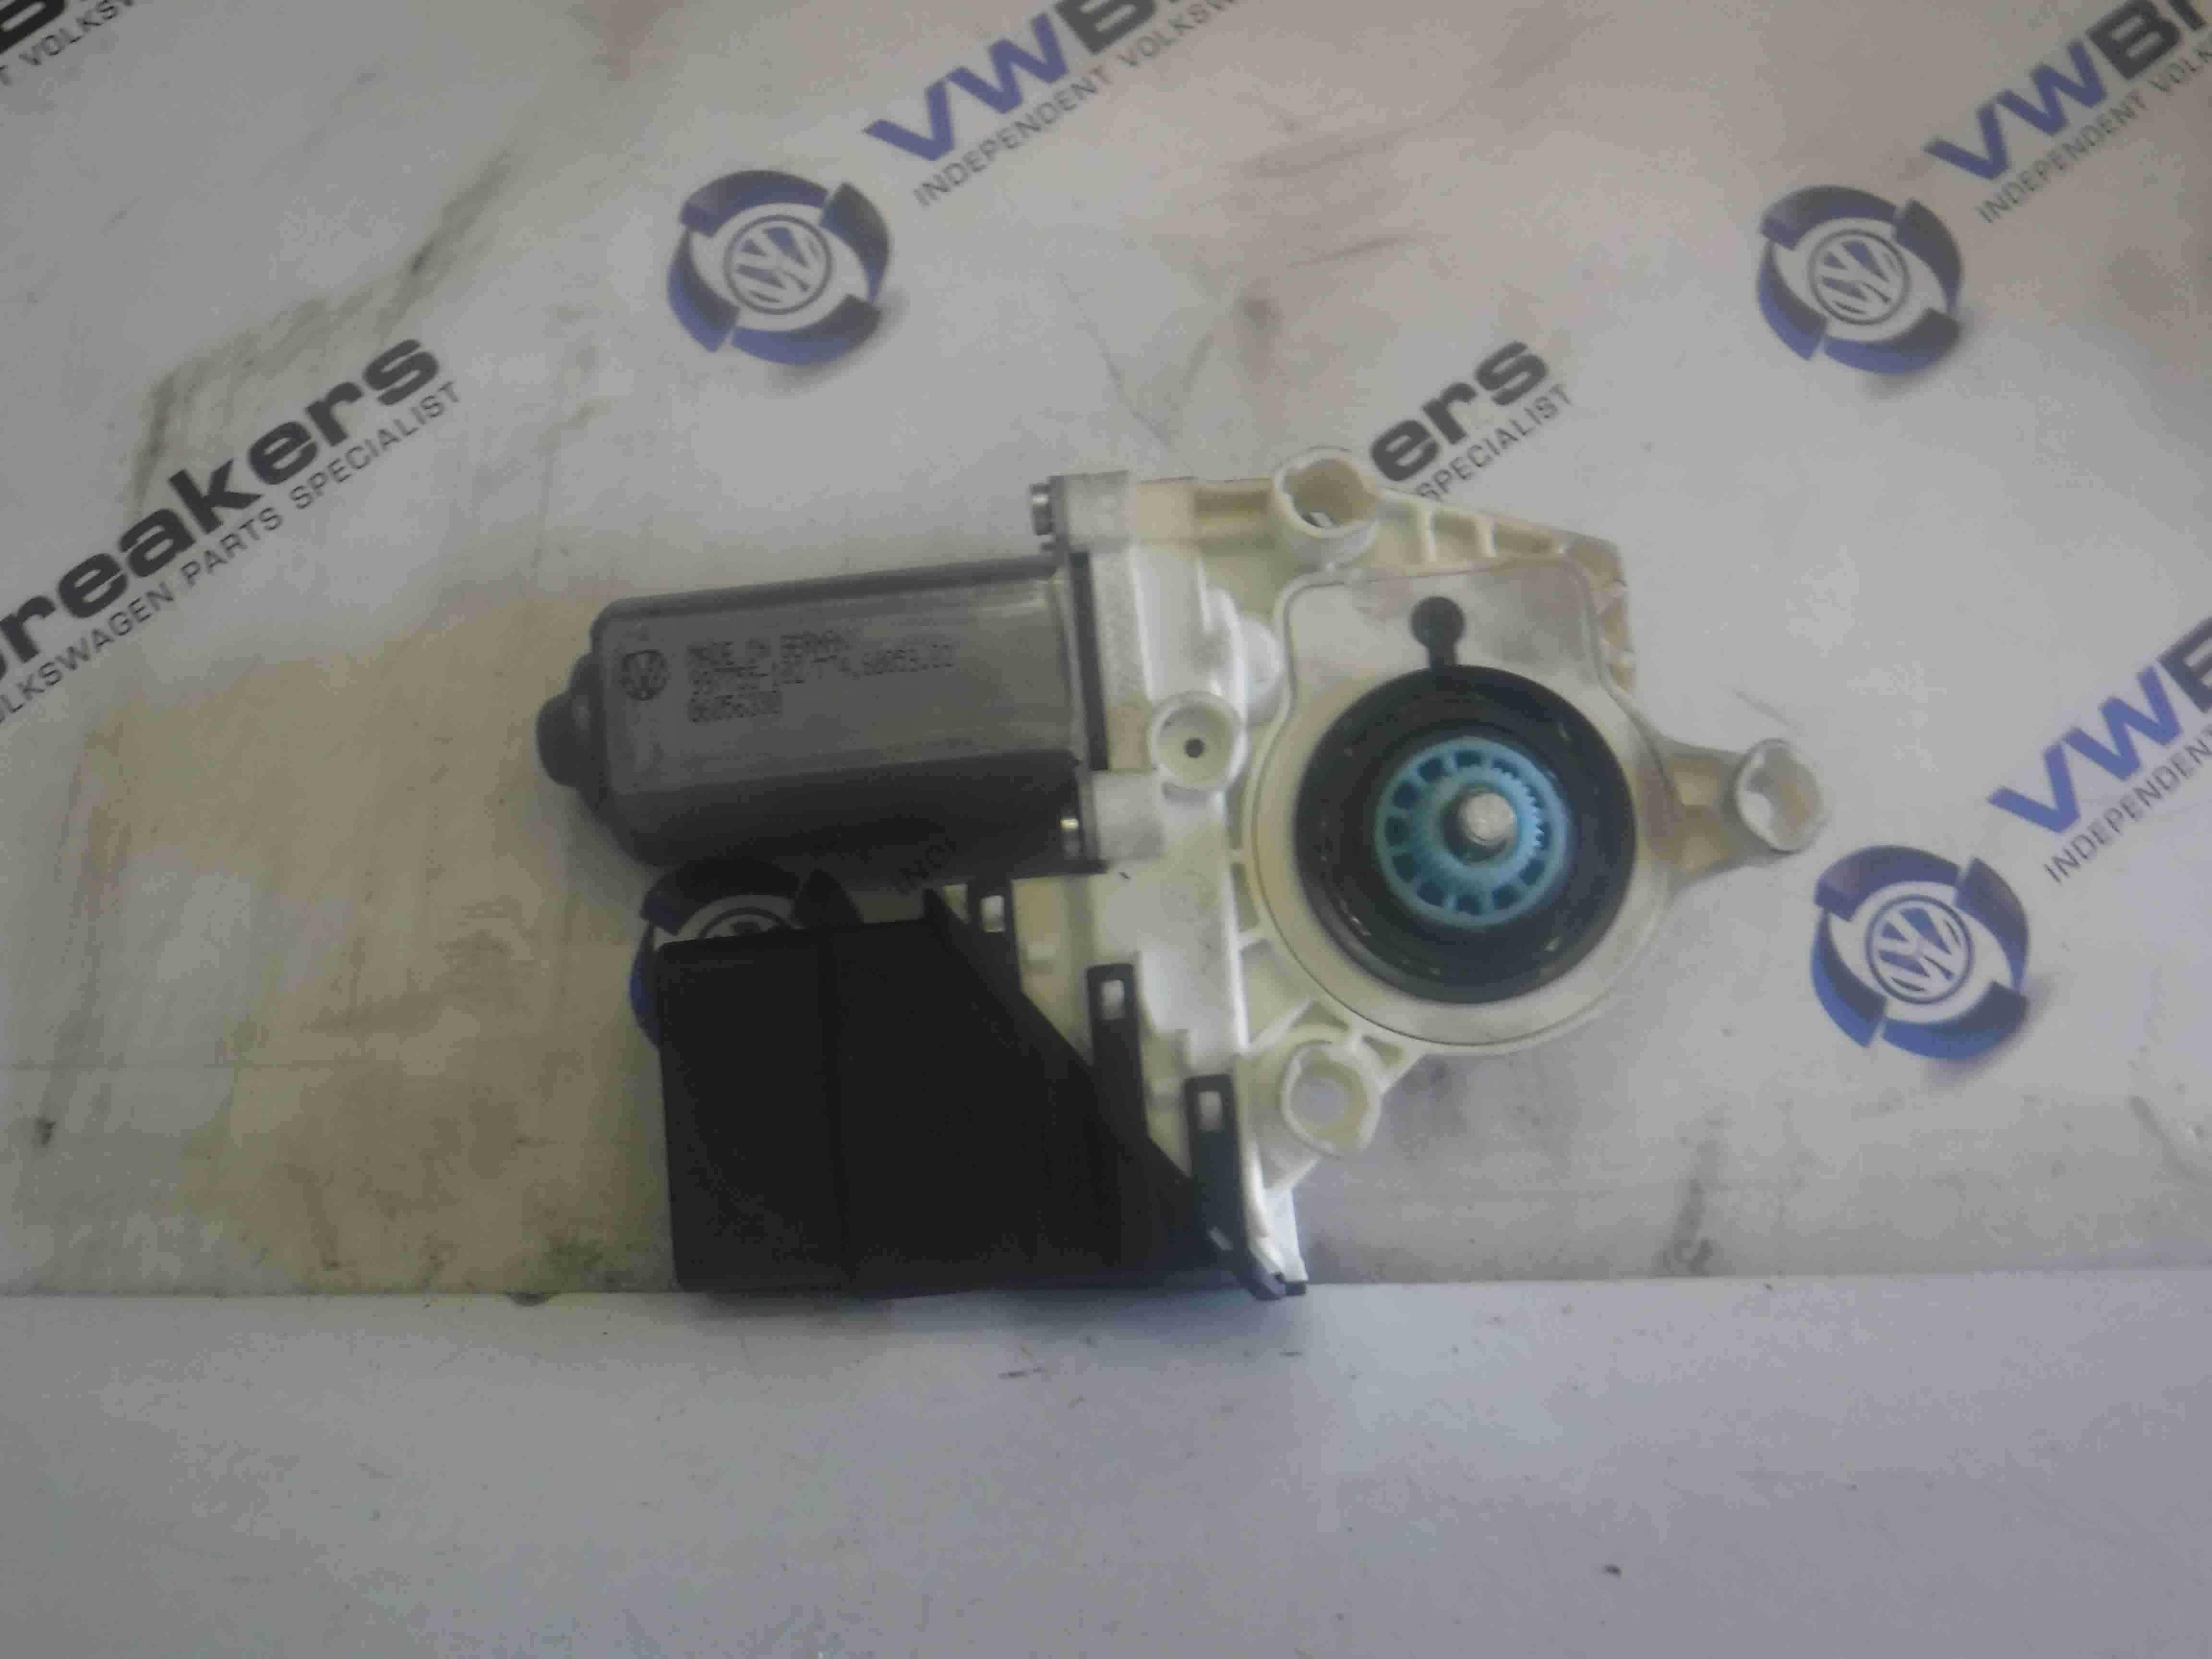 Volkswagen Polo 6R 2009-2014 PDC Parking Sensor Module Distance 000054639